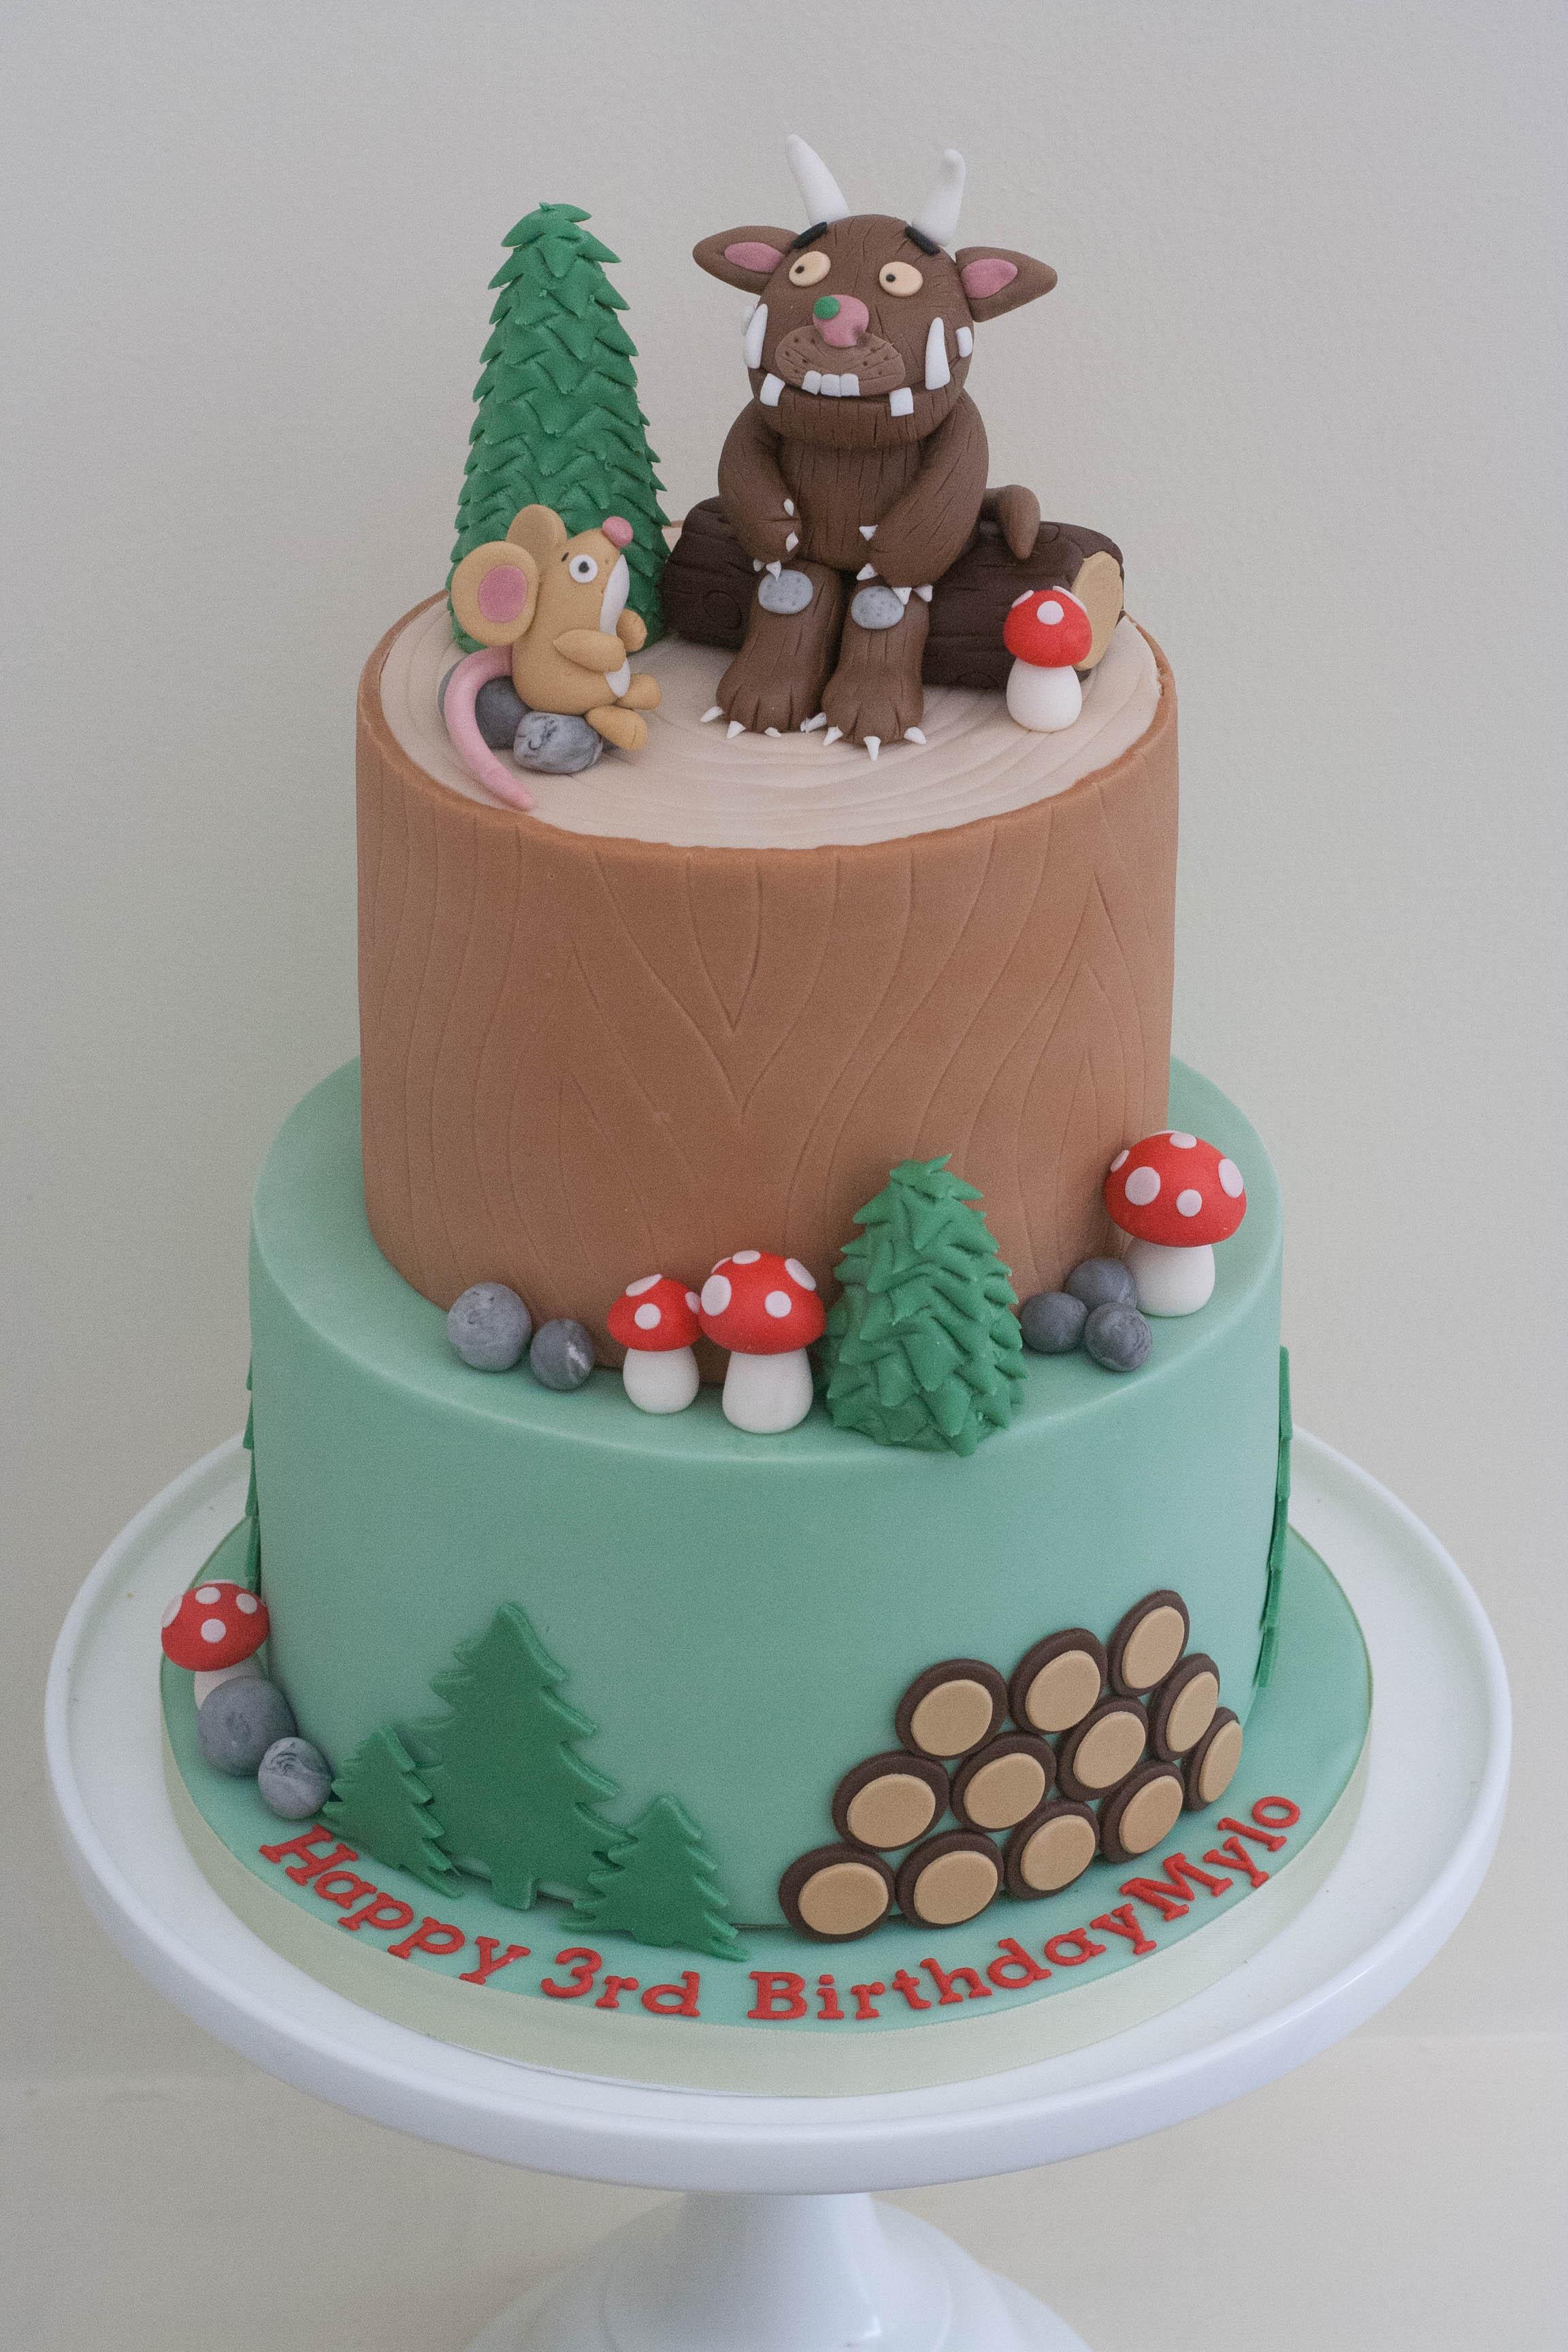 Gruffalo cake vegan